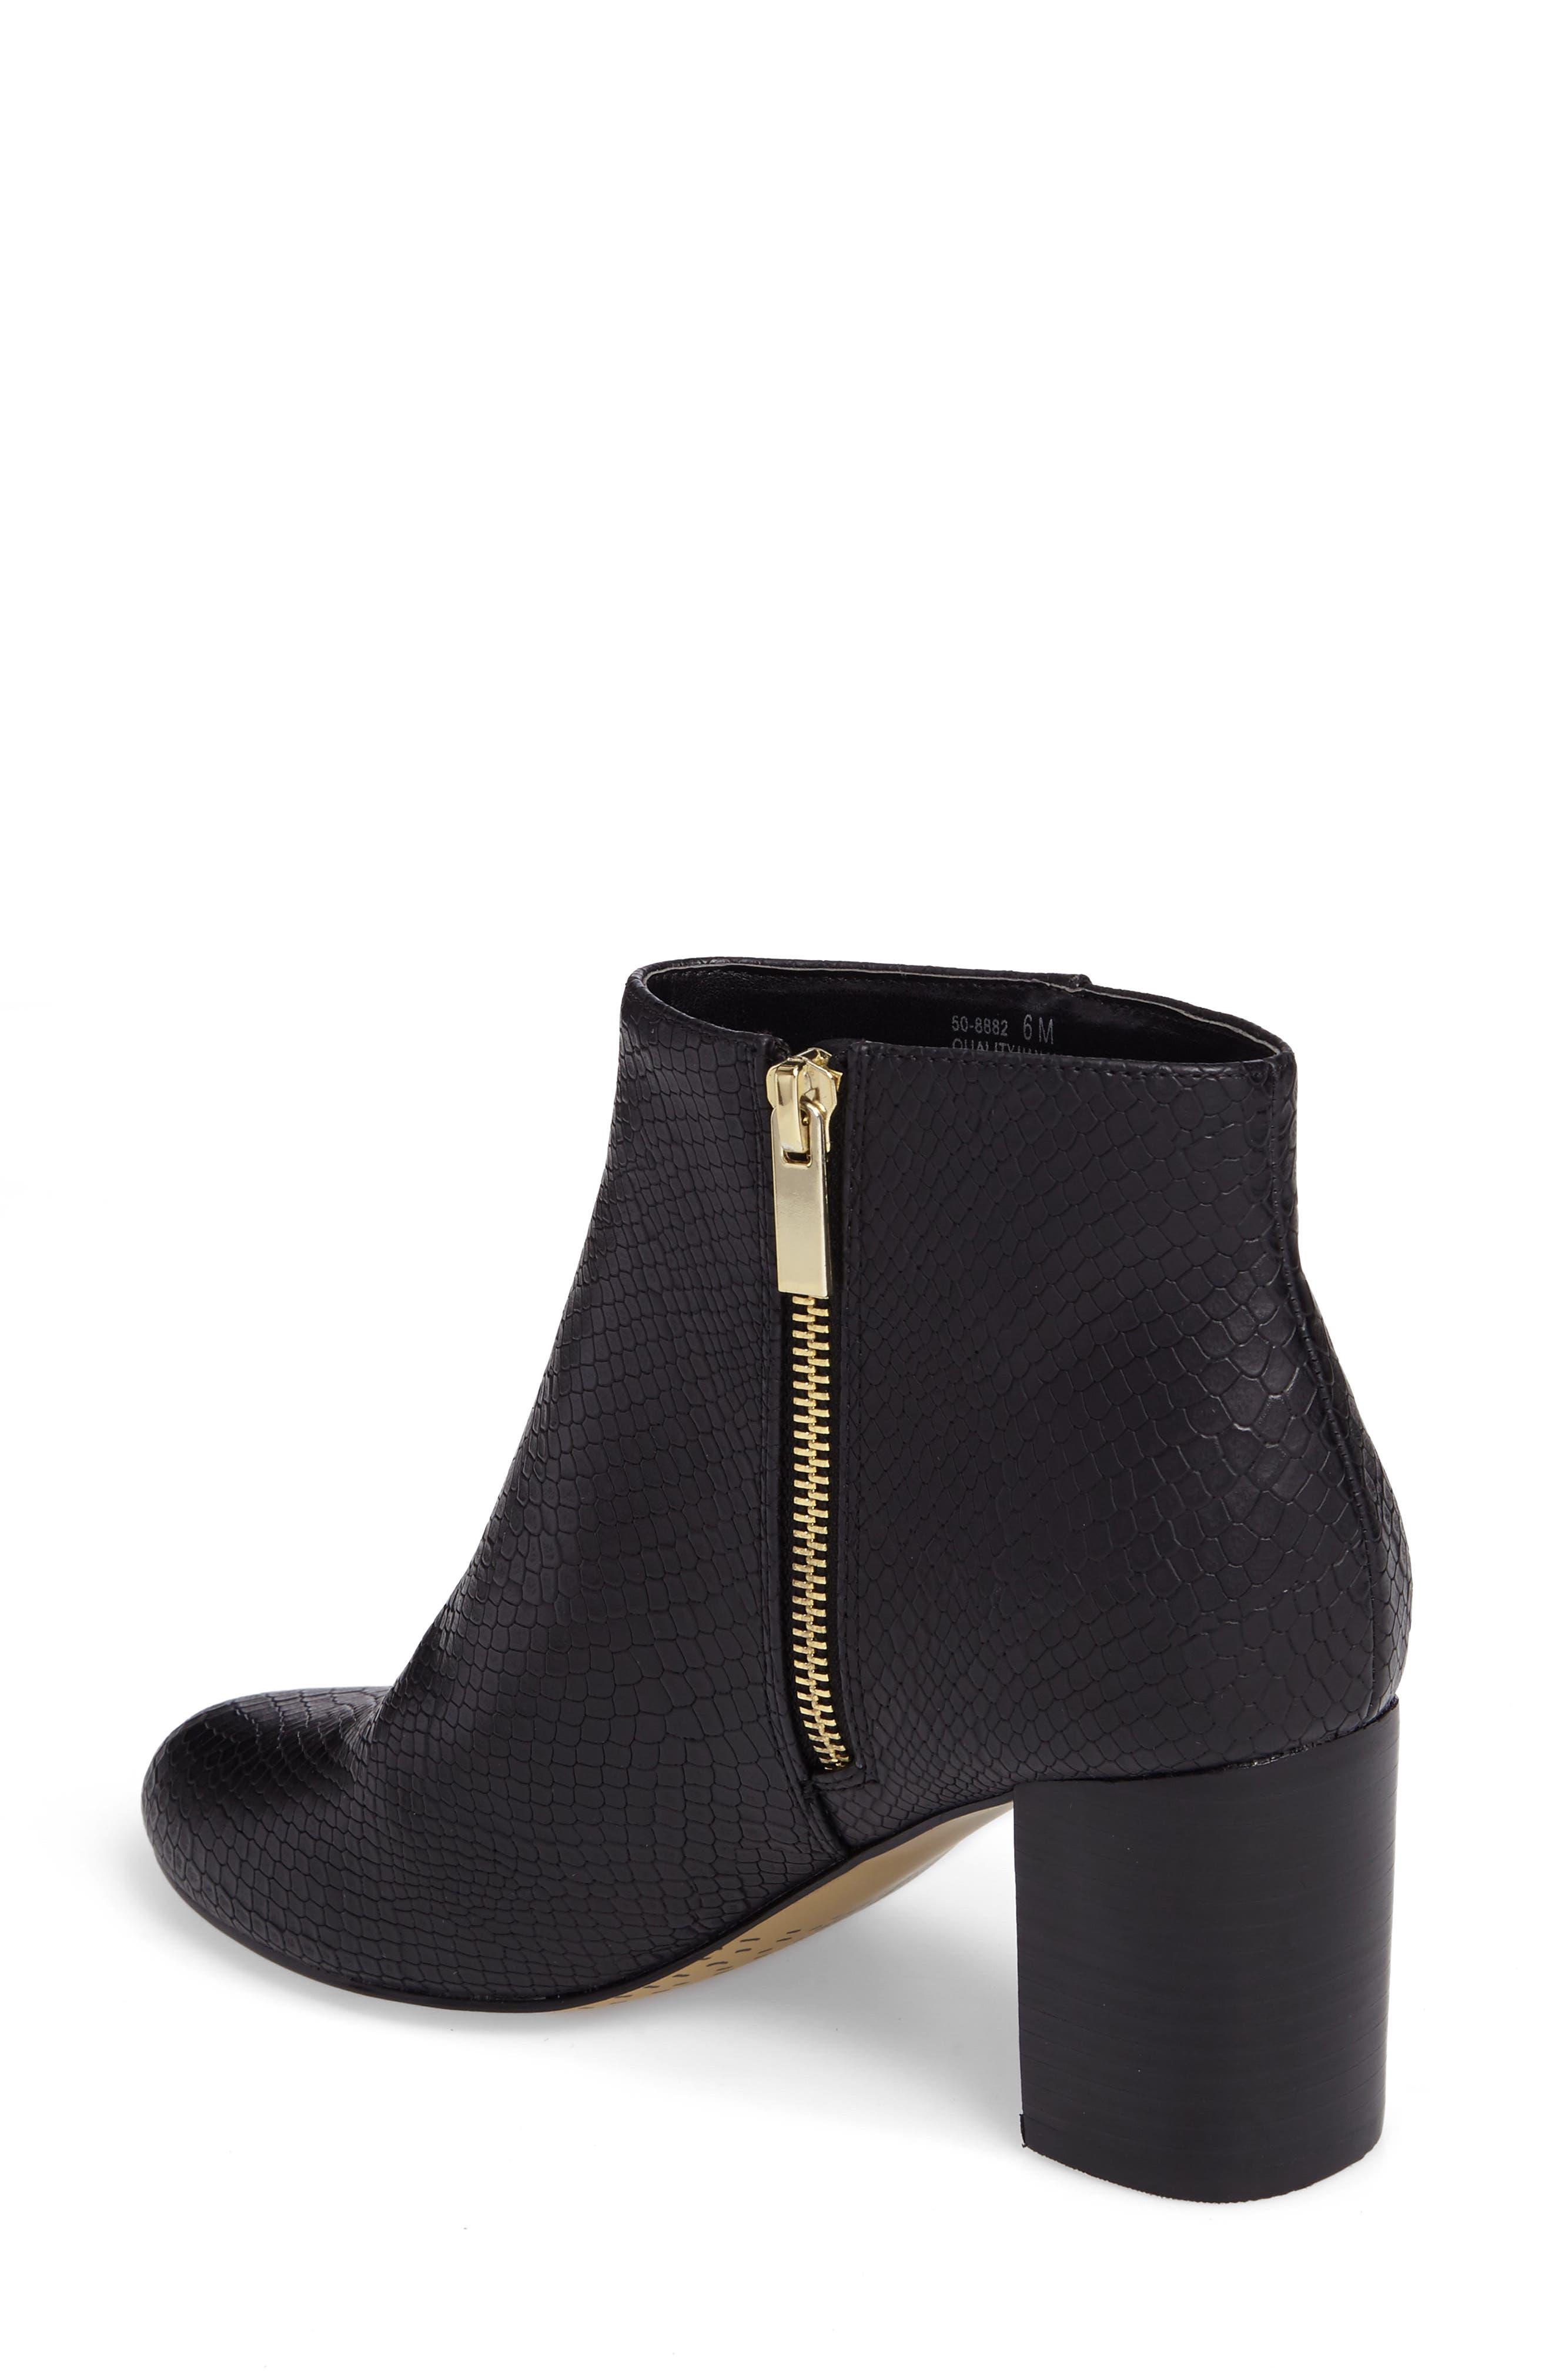 Klaudia II Block Heel Bootie,                             Alternate thumbnail 2, color,                             Black Printed Leather